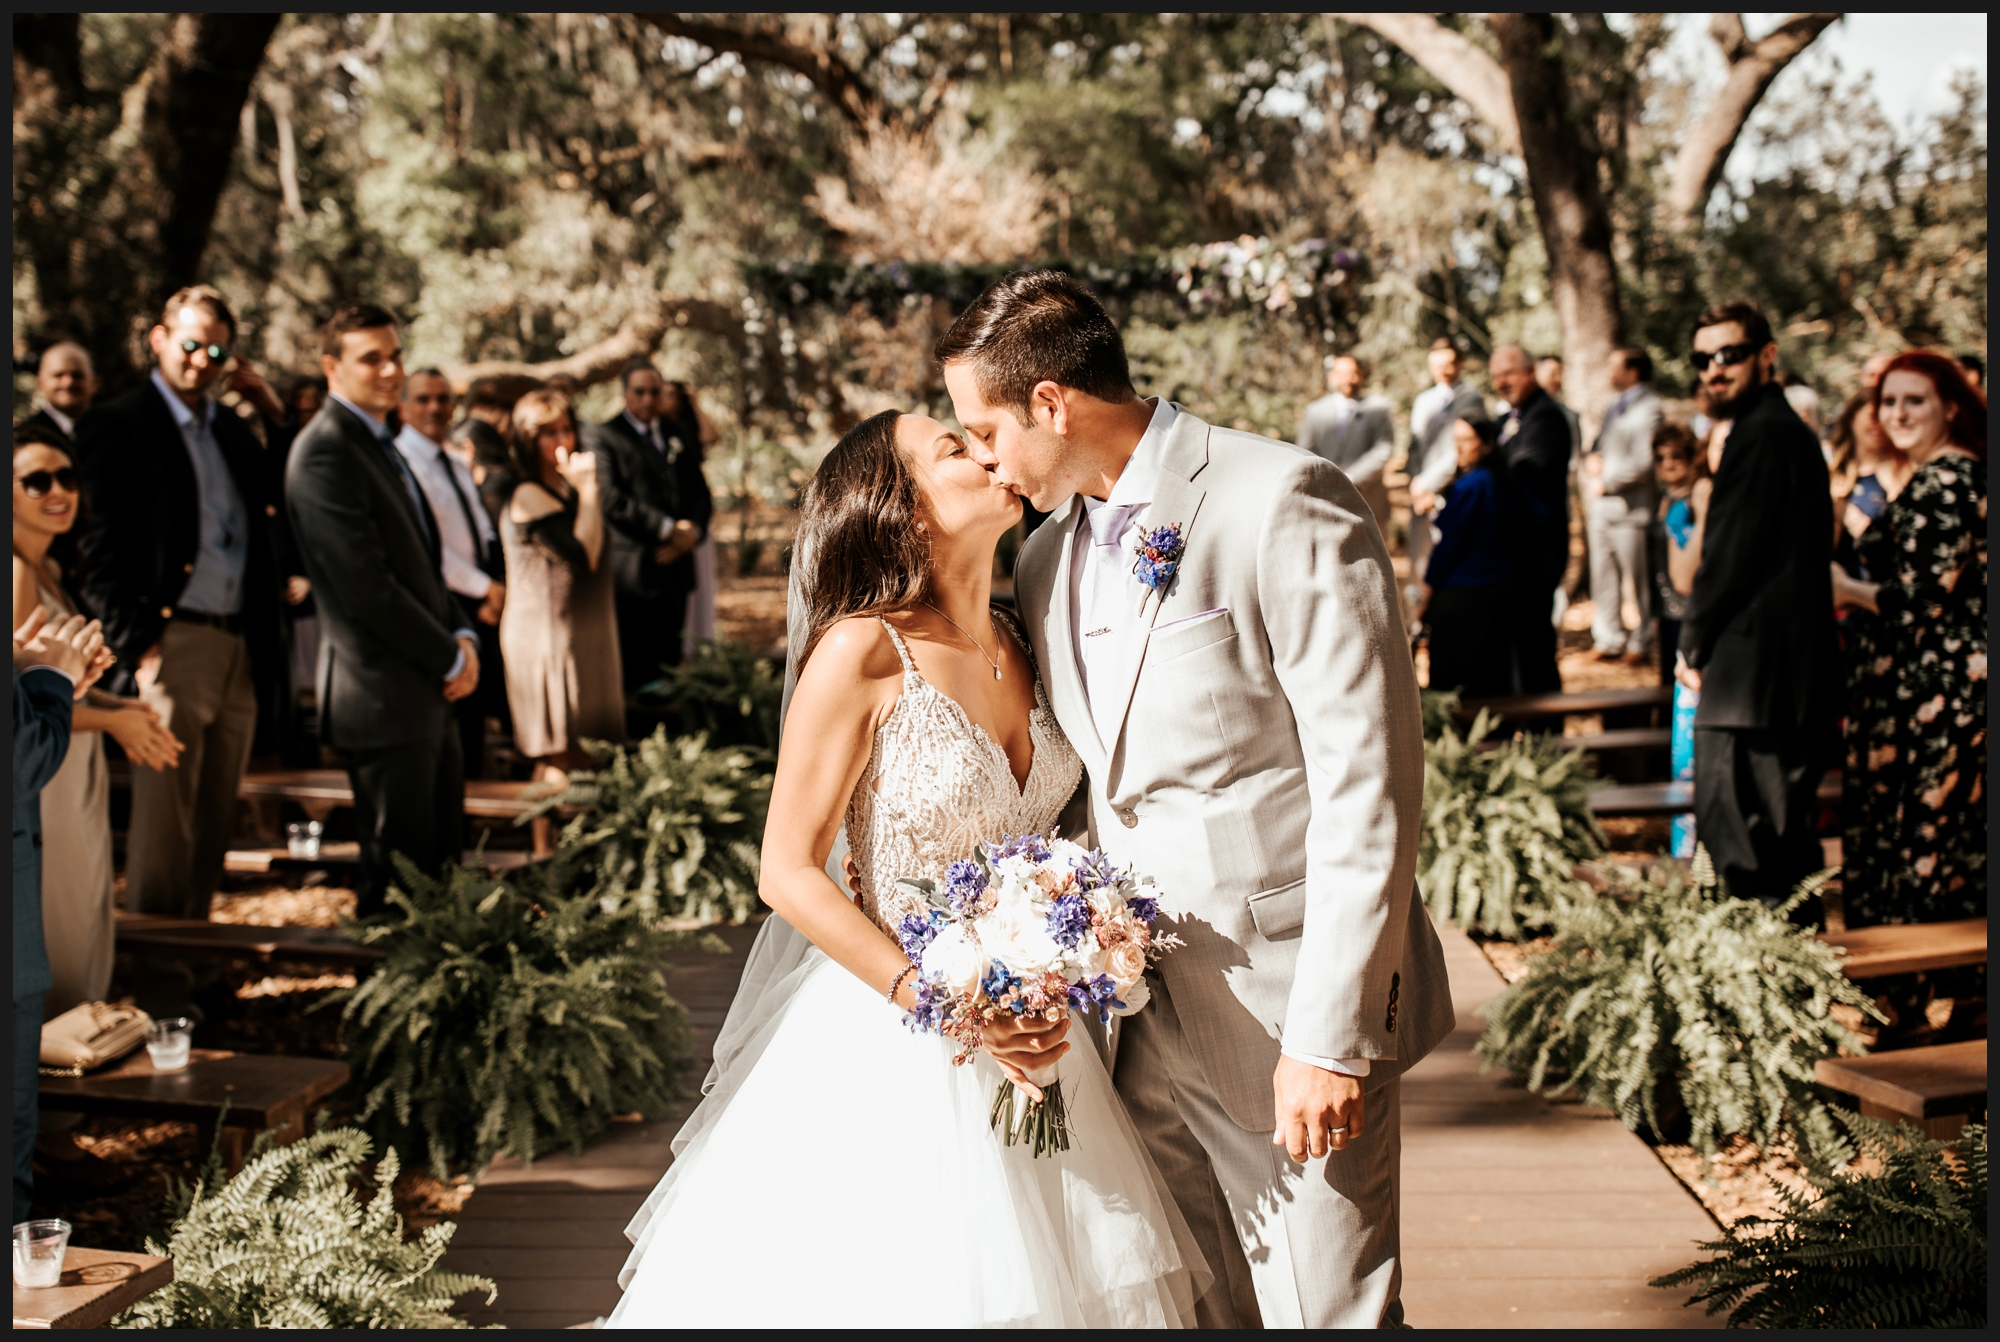 Orlando-Wedding-Photographer-destination-wedding-photographer-florida-wedding-photographer-bohemian-wedding-photographer_1617.jpg